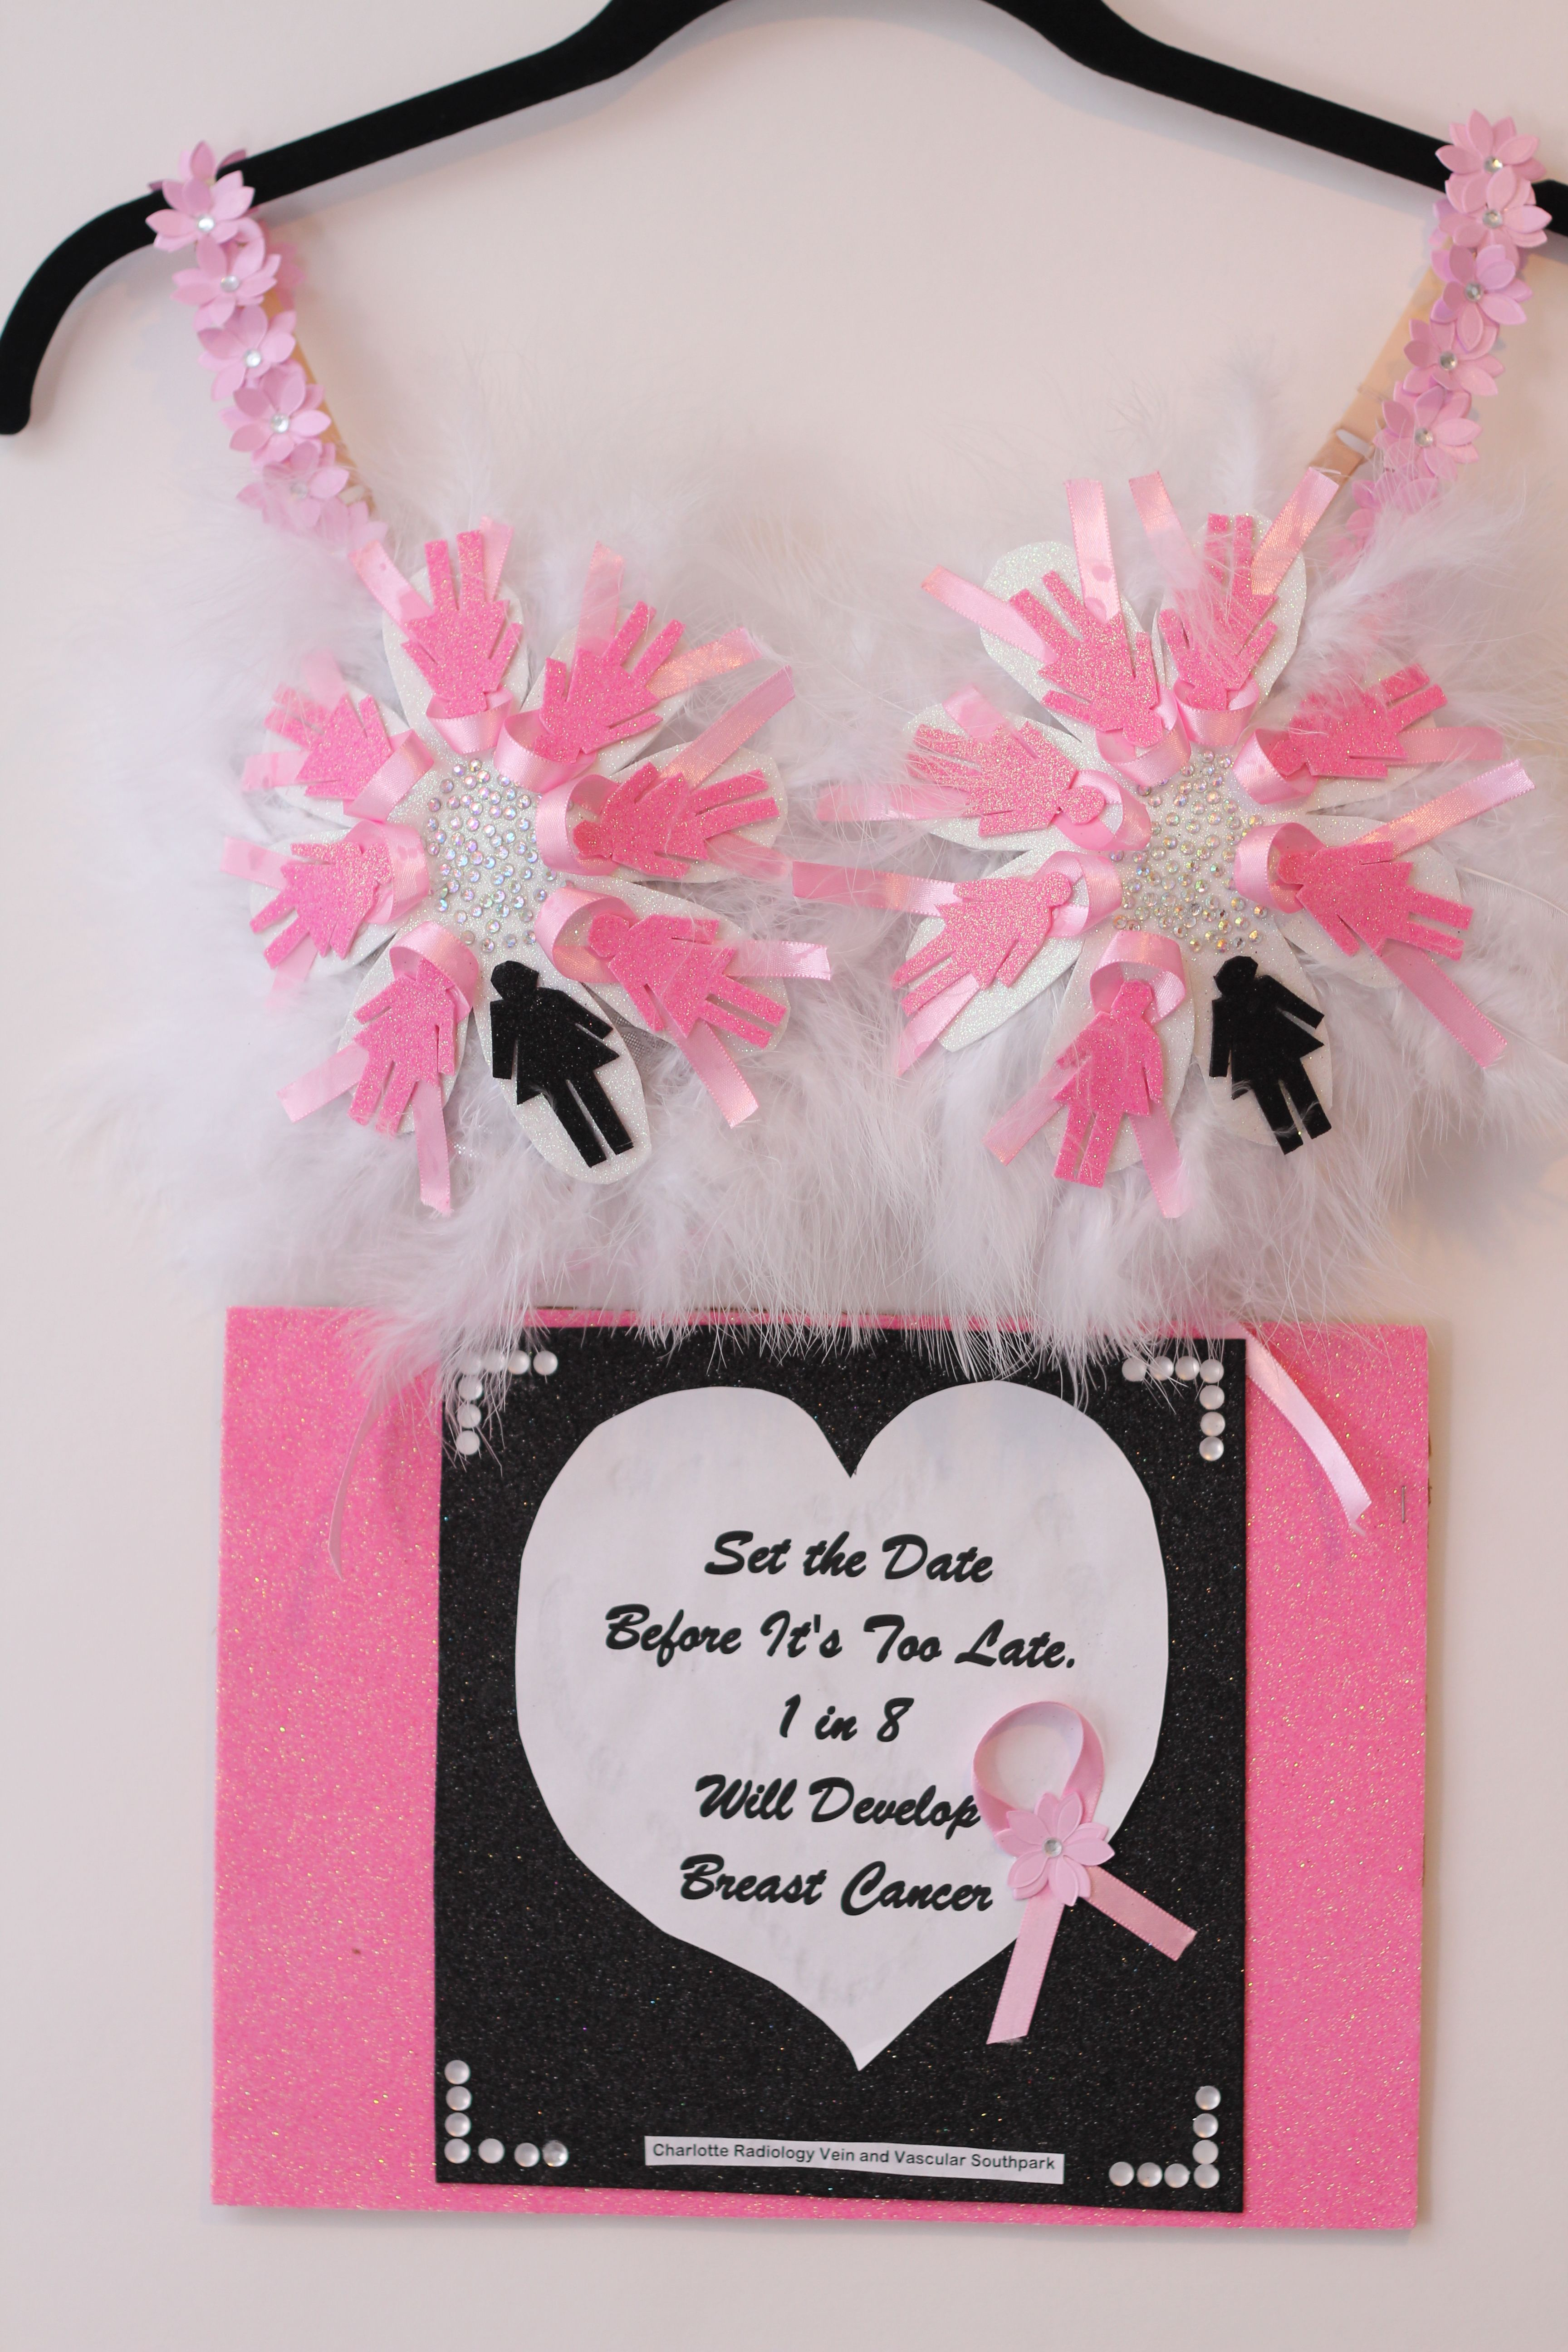 15 Best Cr Bras 2012 Images On Pinterest Breast Cancer Art Breast